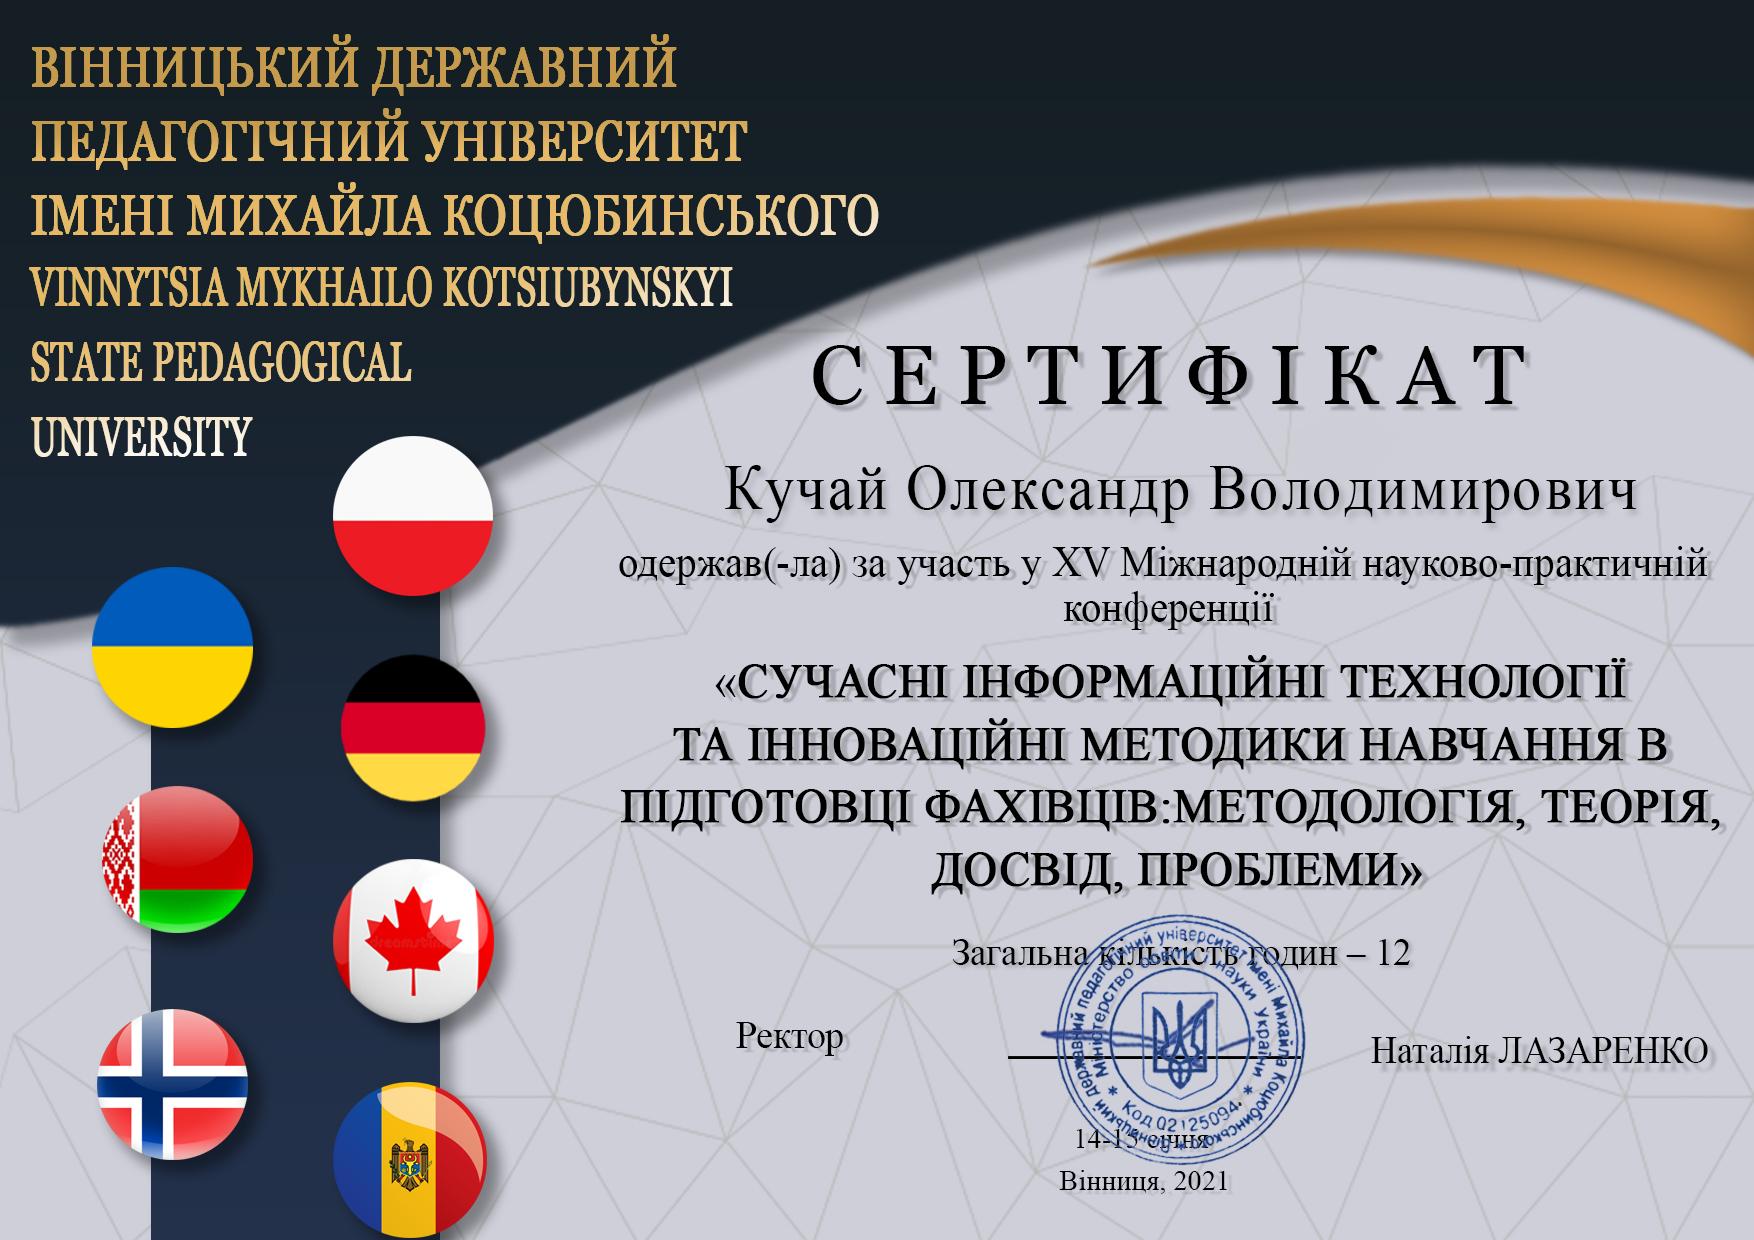 Кучай Олександр Володимирович